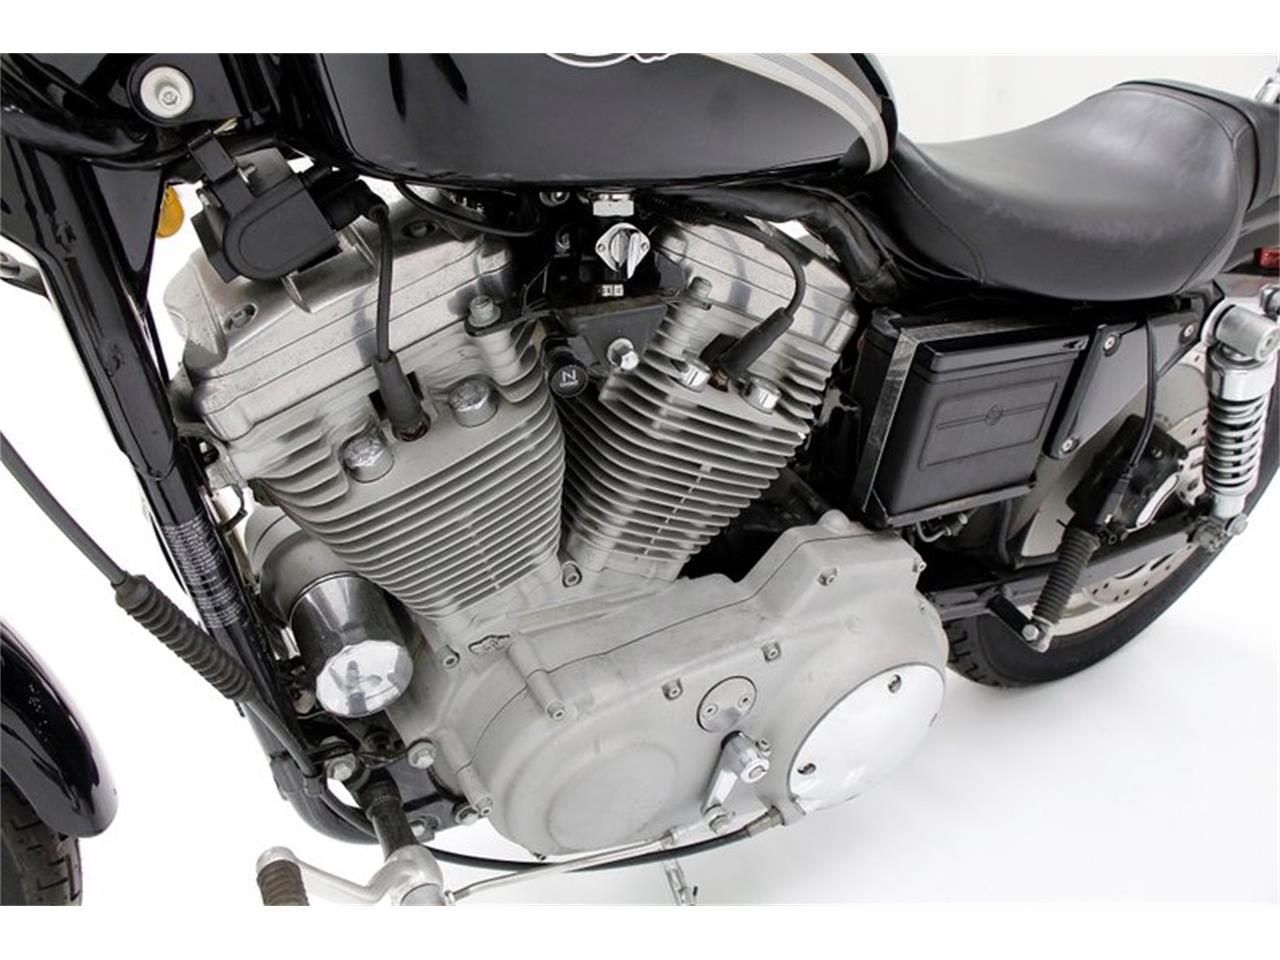 2003 Harley-Davidson Sportster (CC-1268443) for sale in Morgantown, Pennsylvania